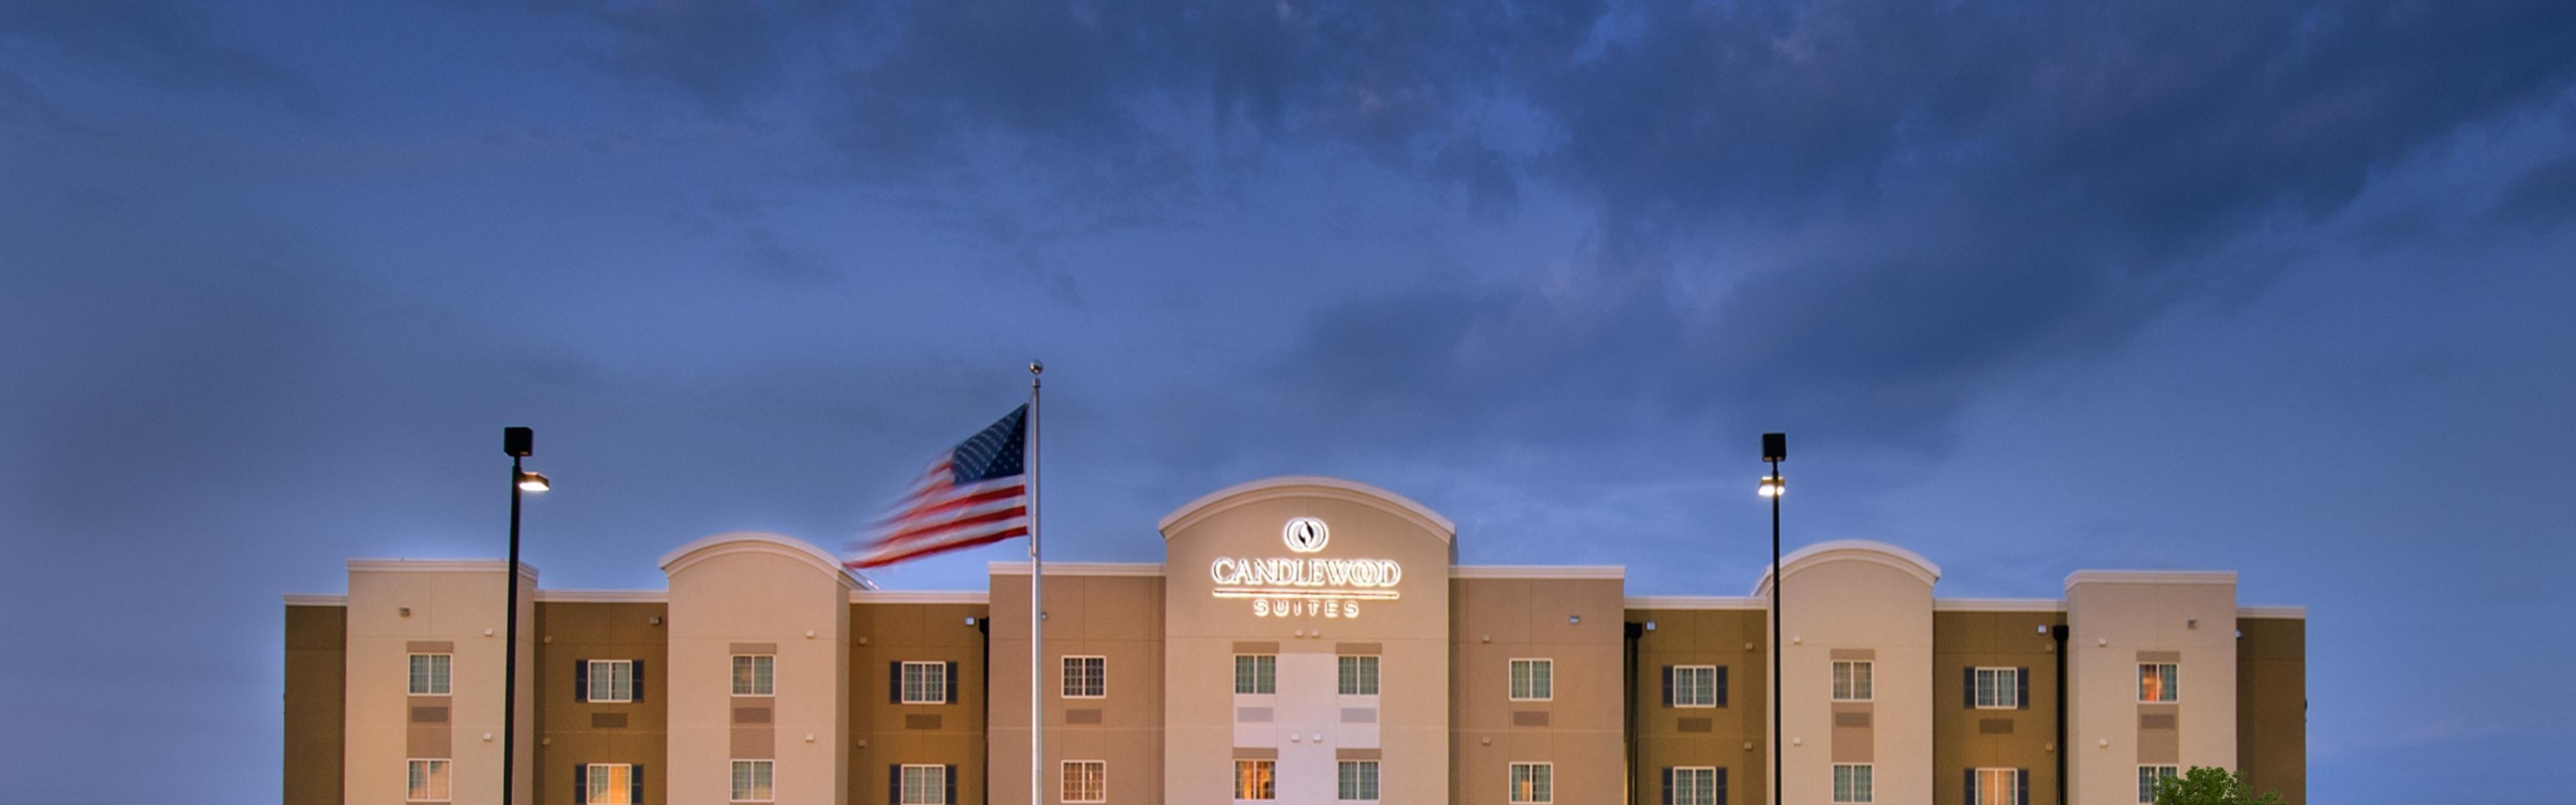 Candlewood Suites Fort Worth/West image 0